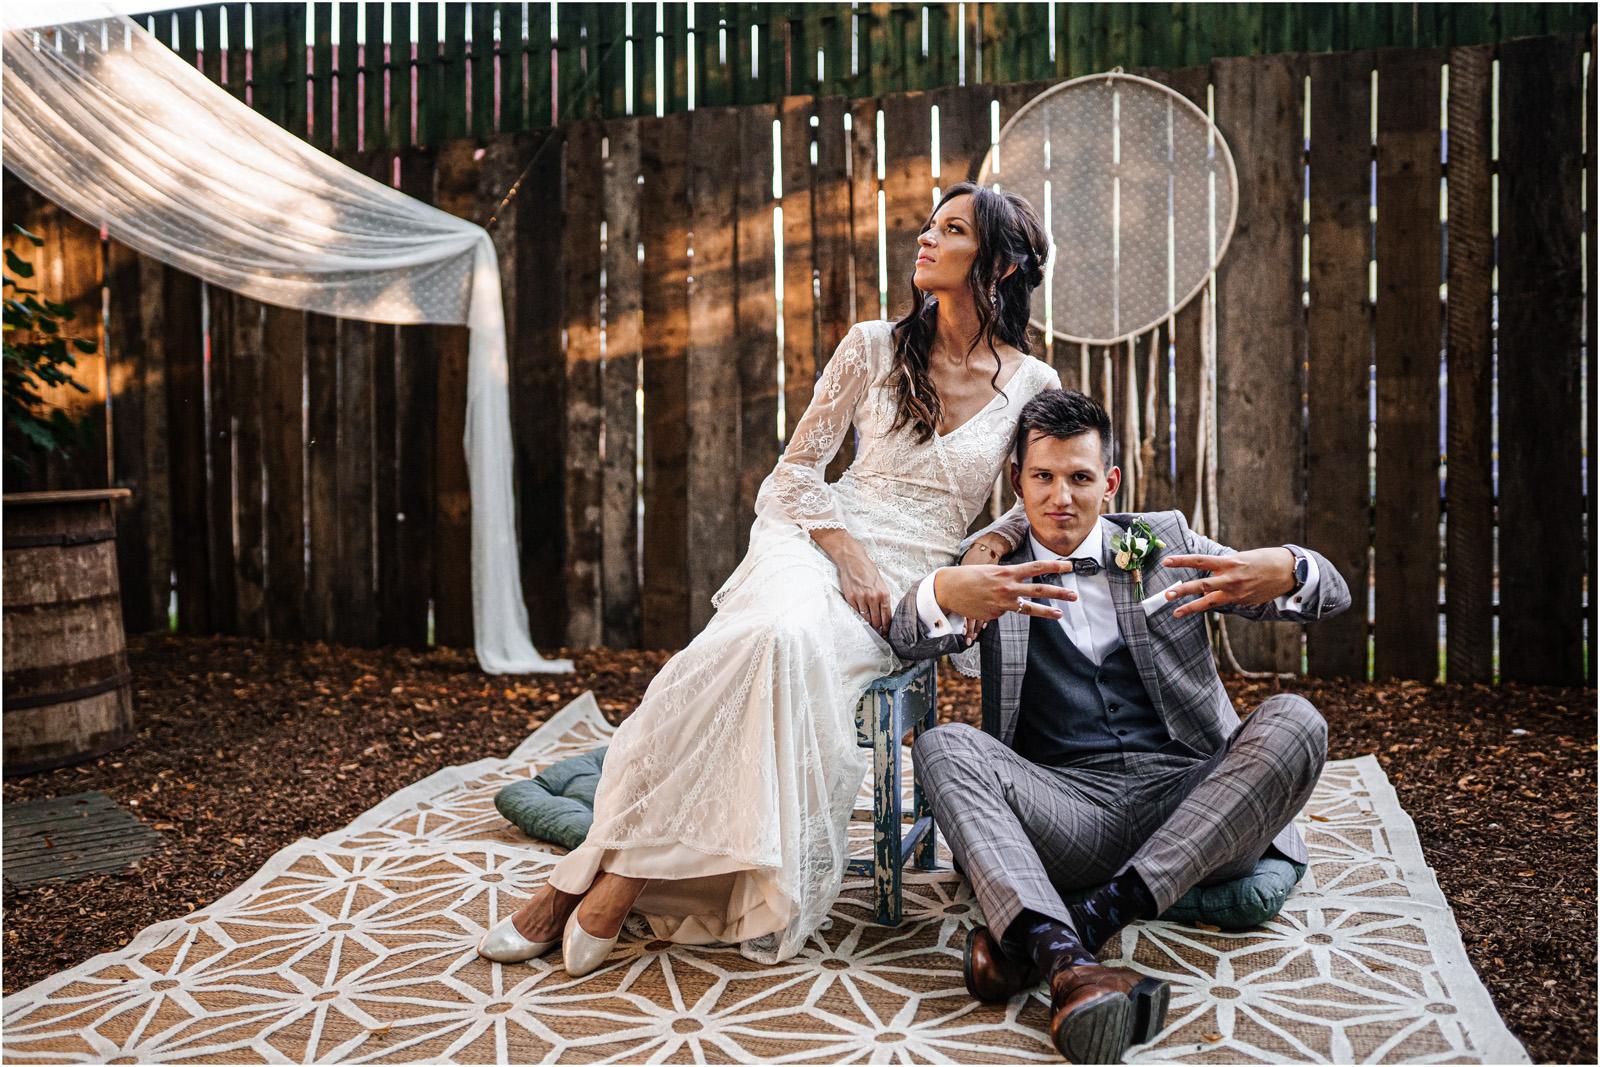 Ania & Mateusz | boho wesele w Stodole pod Kasztanami 95